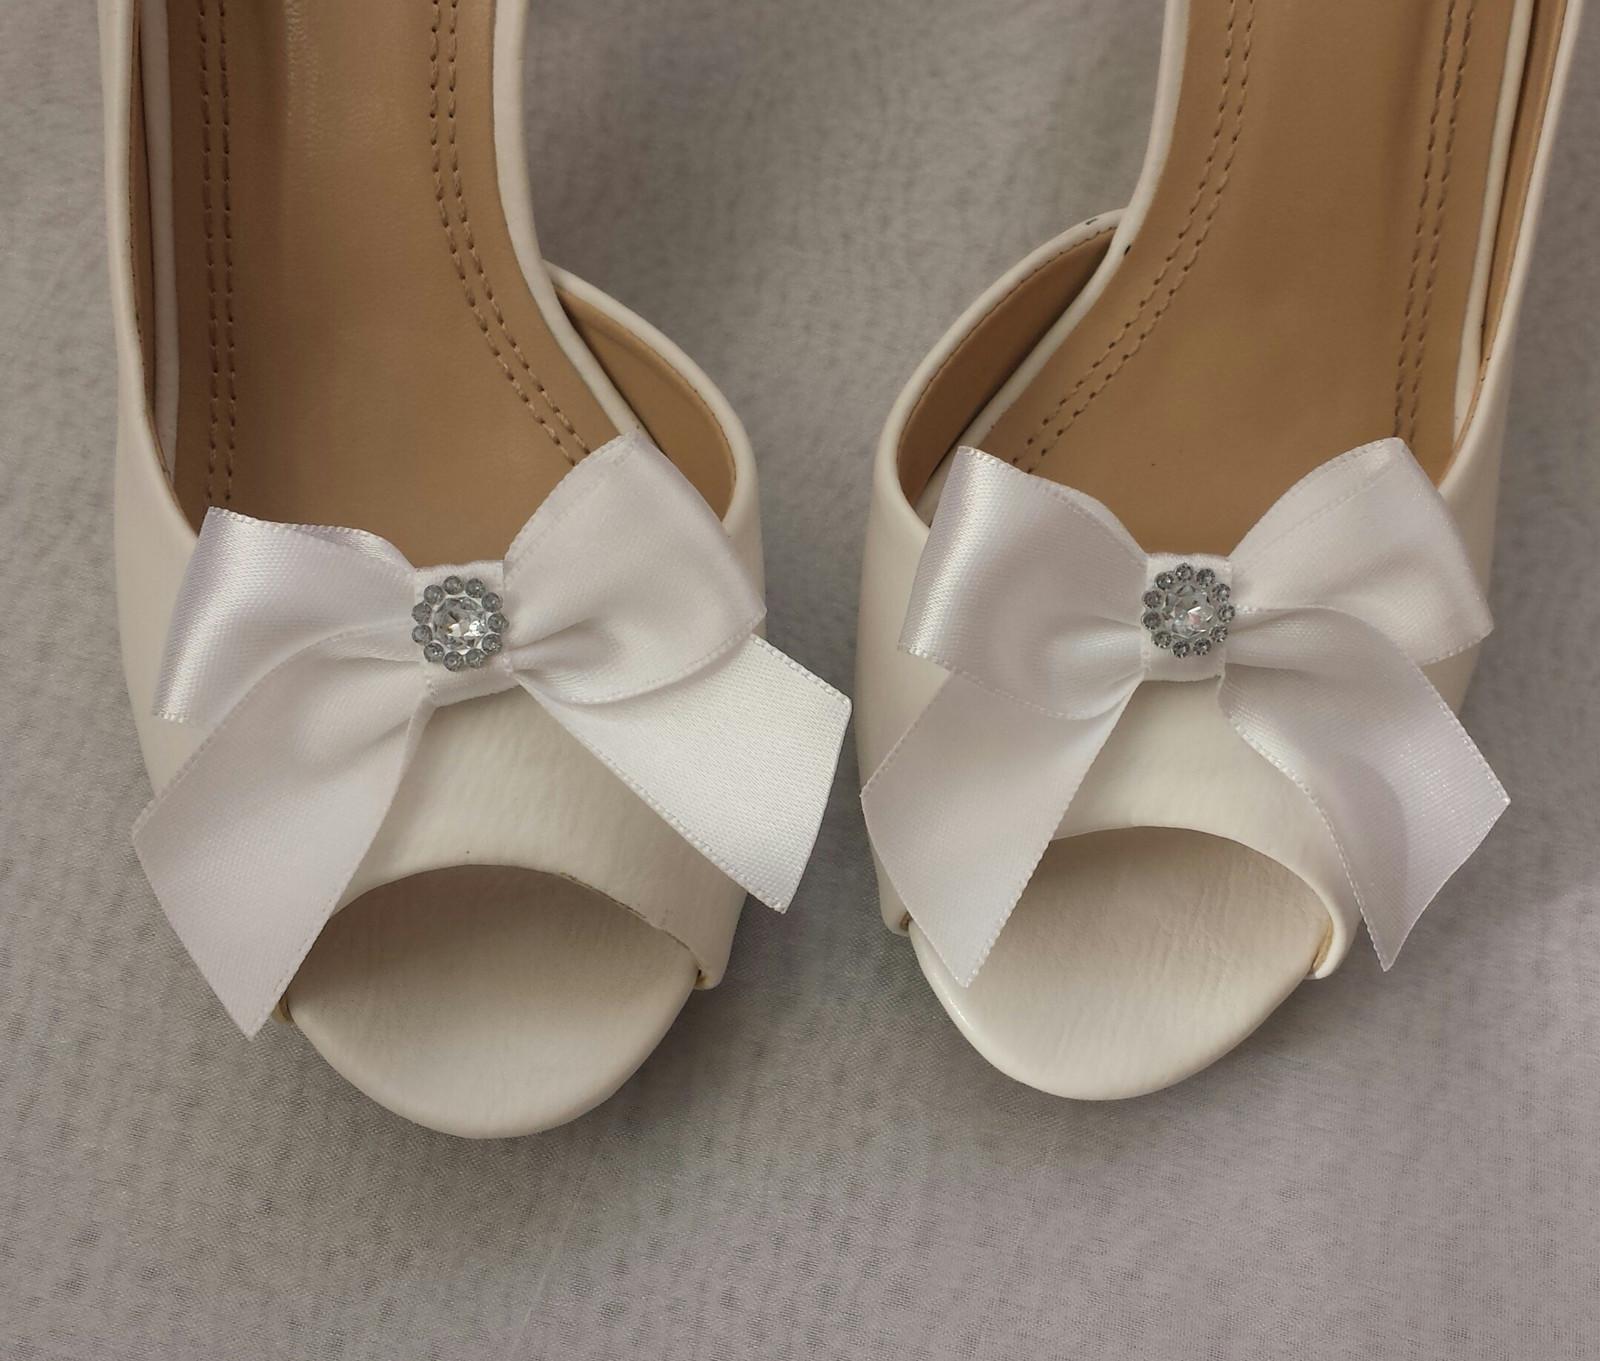 Klipy na boty s bílou mašličkou a brožičkou - Obrázek č. 1